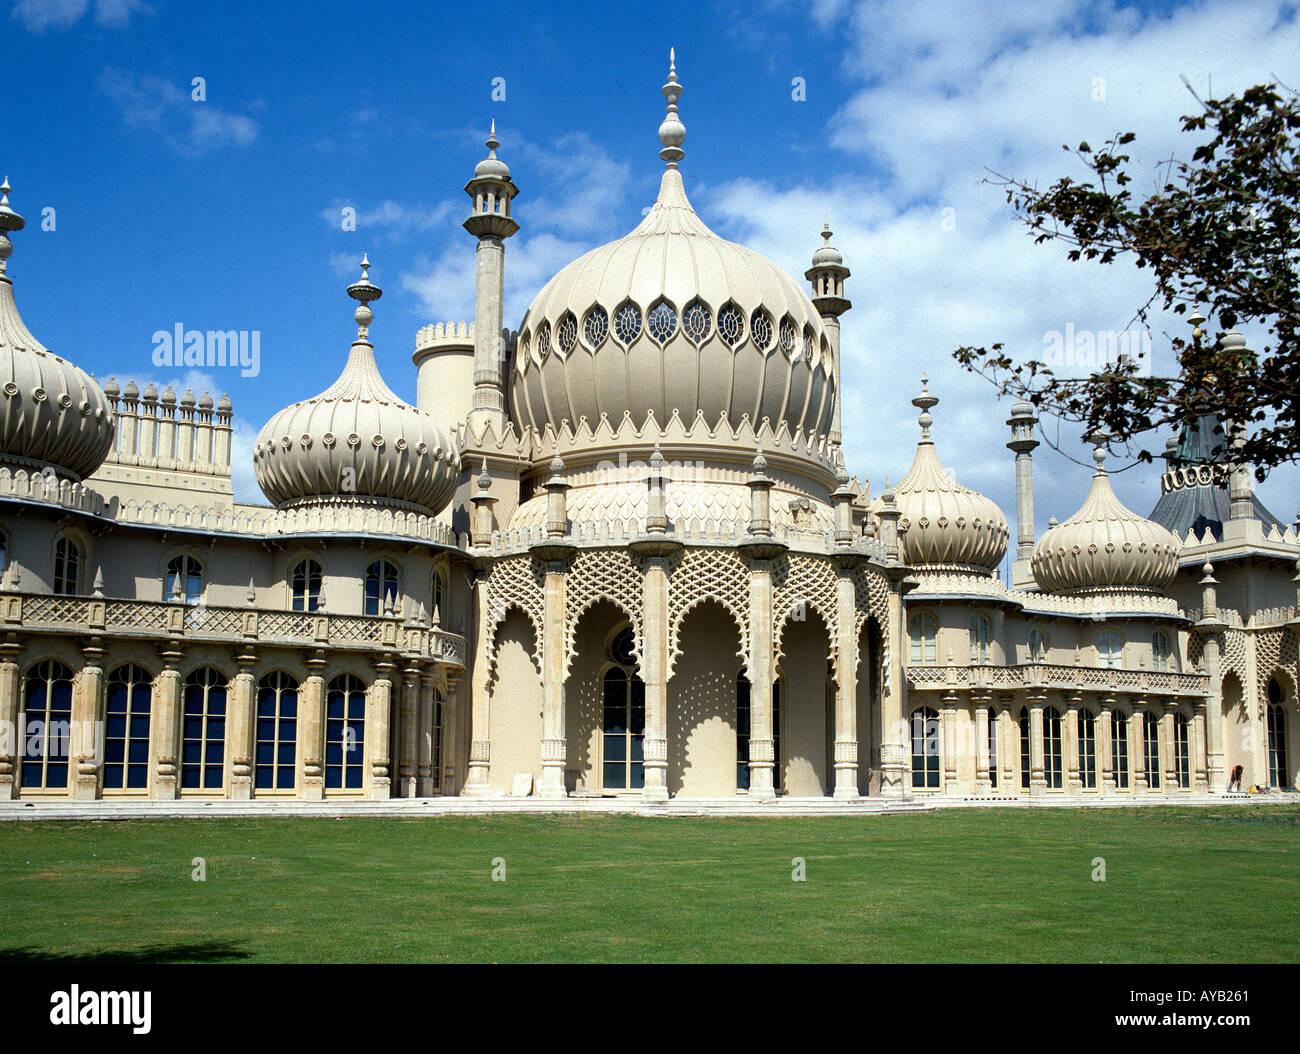 The Royal Pavilion at Brighton - Stock Image